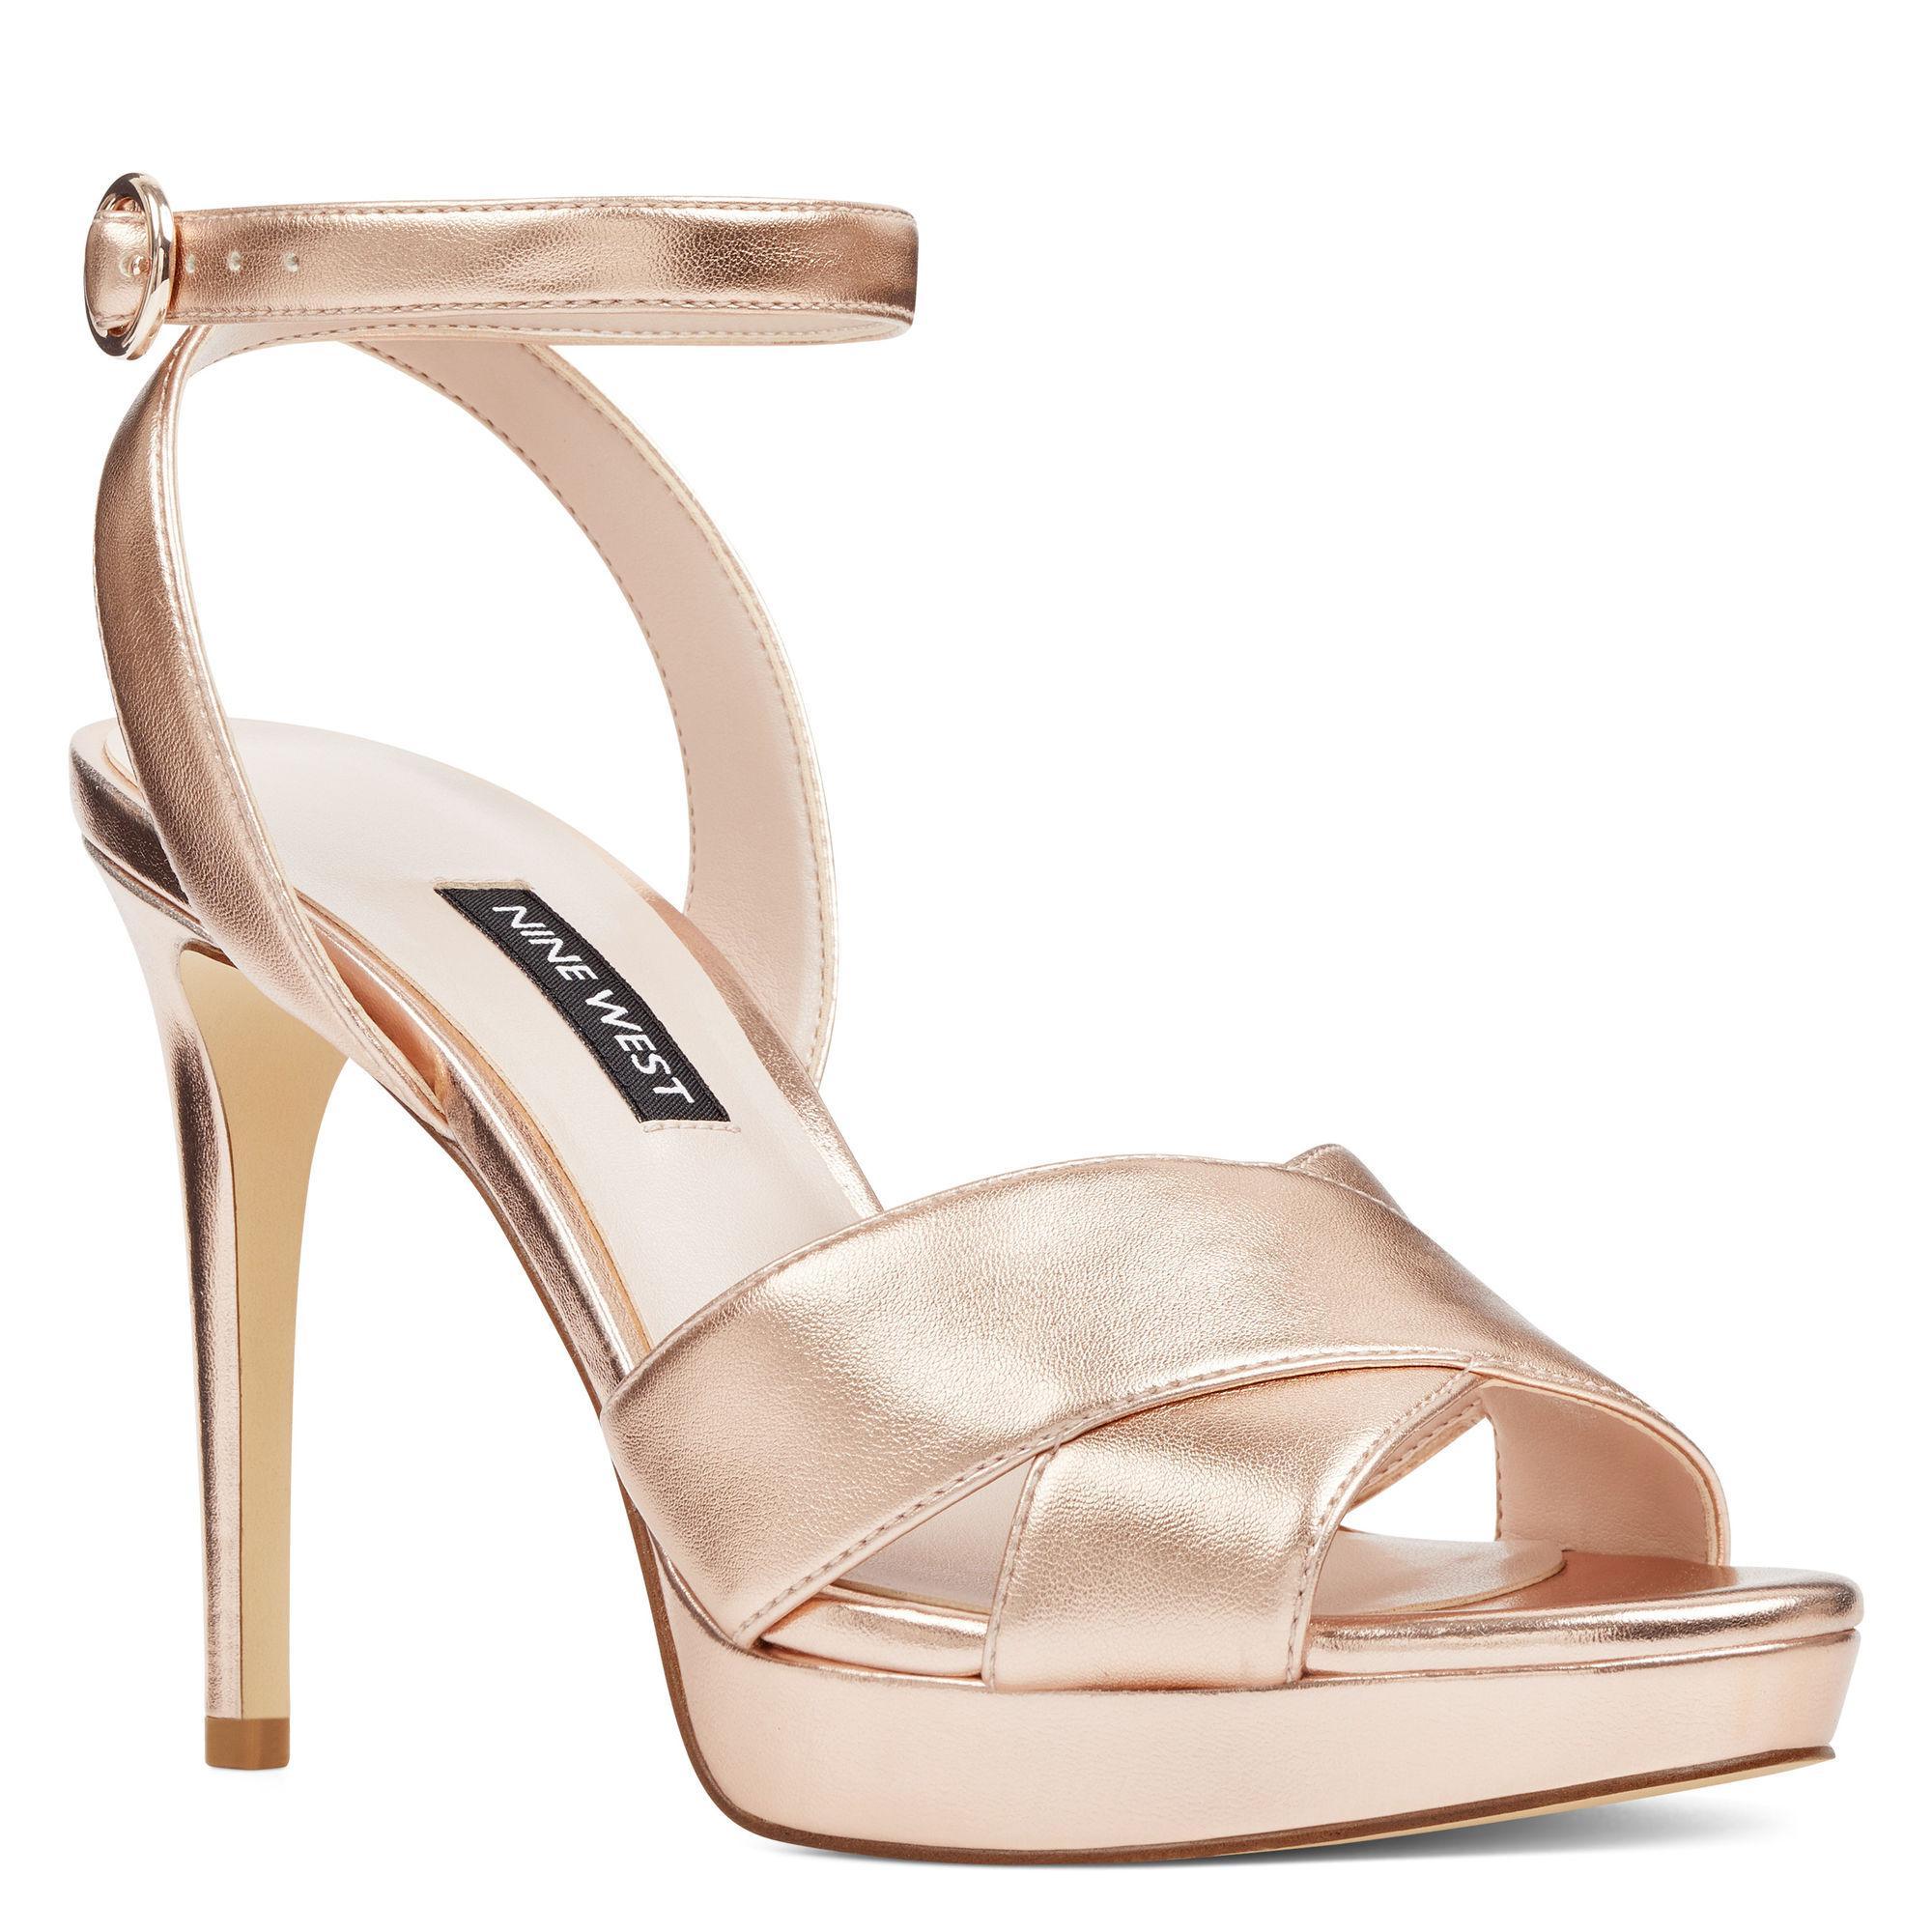 201ed20ab0d0 Lyst - Nine West Quisha Ankle Strap Sandals